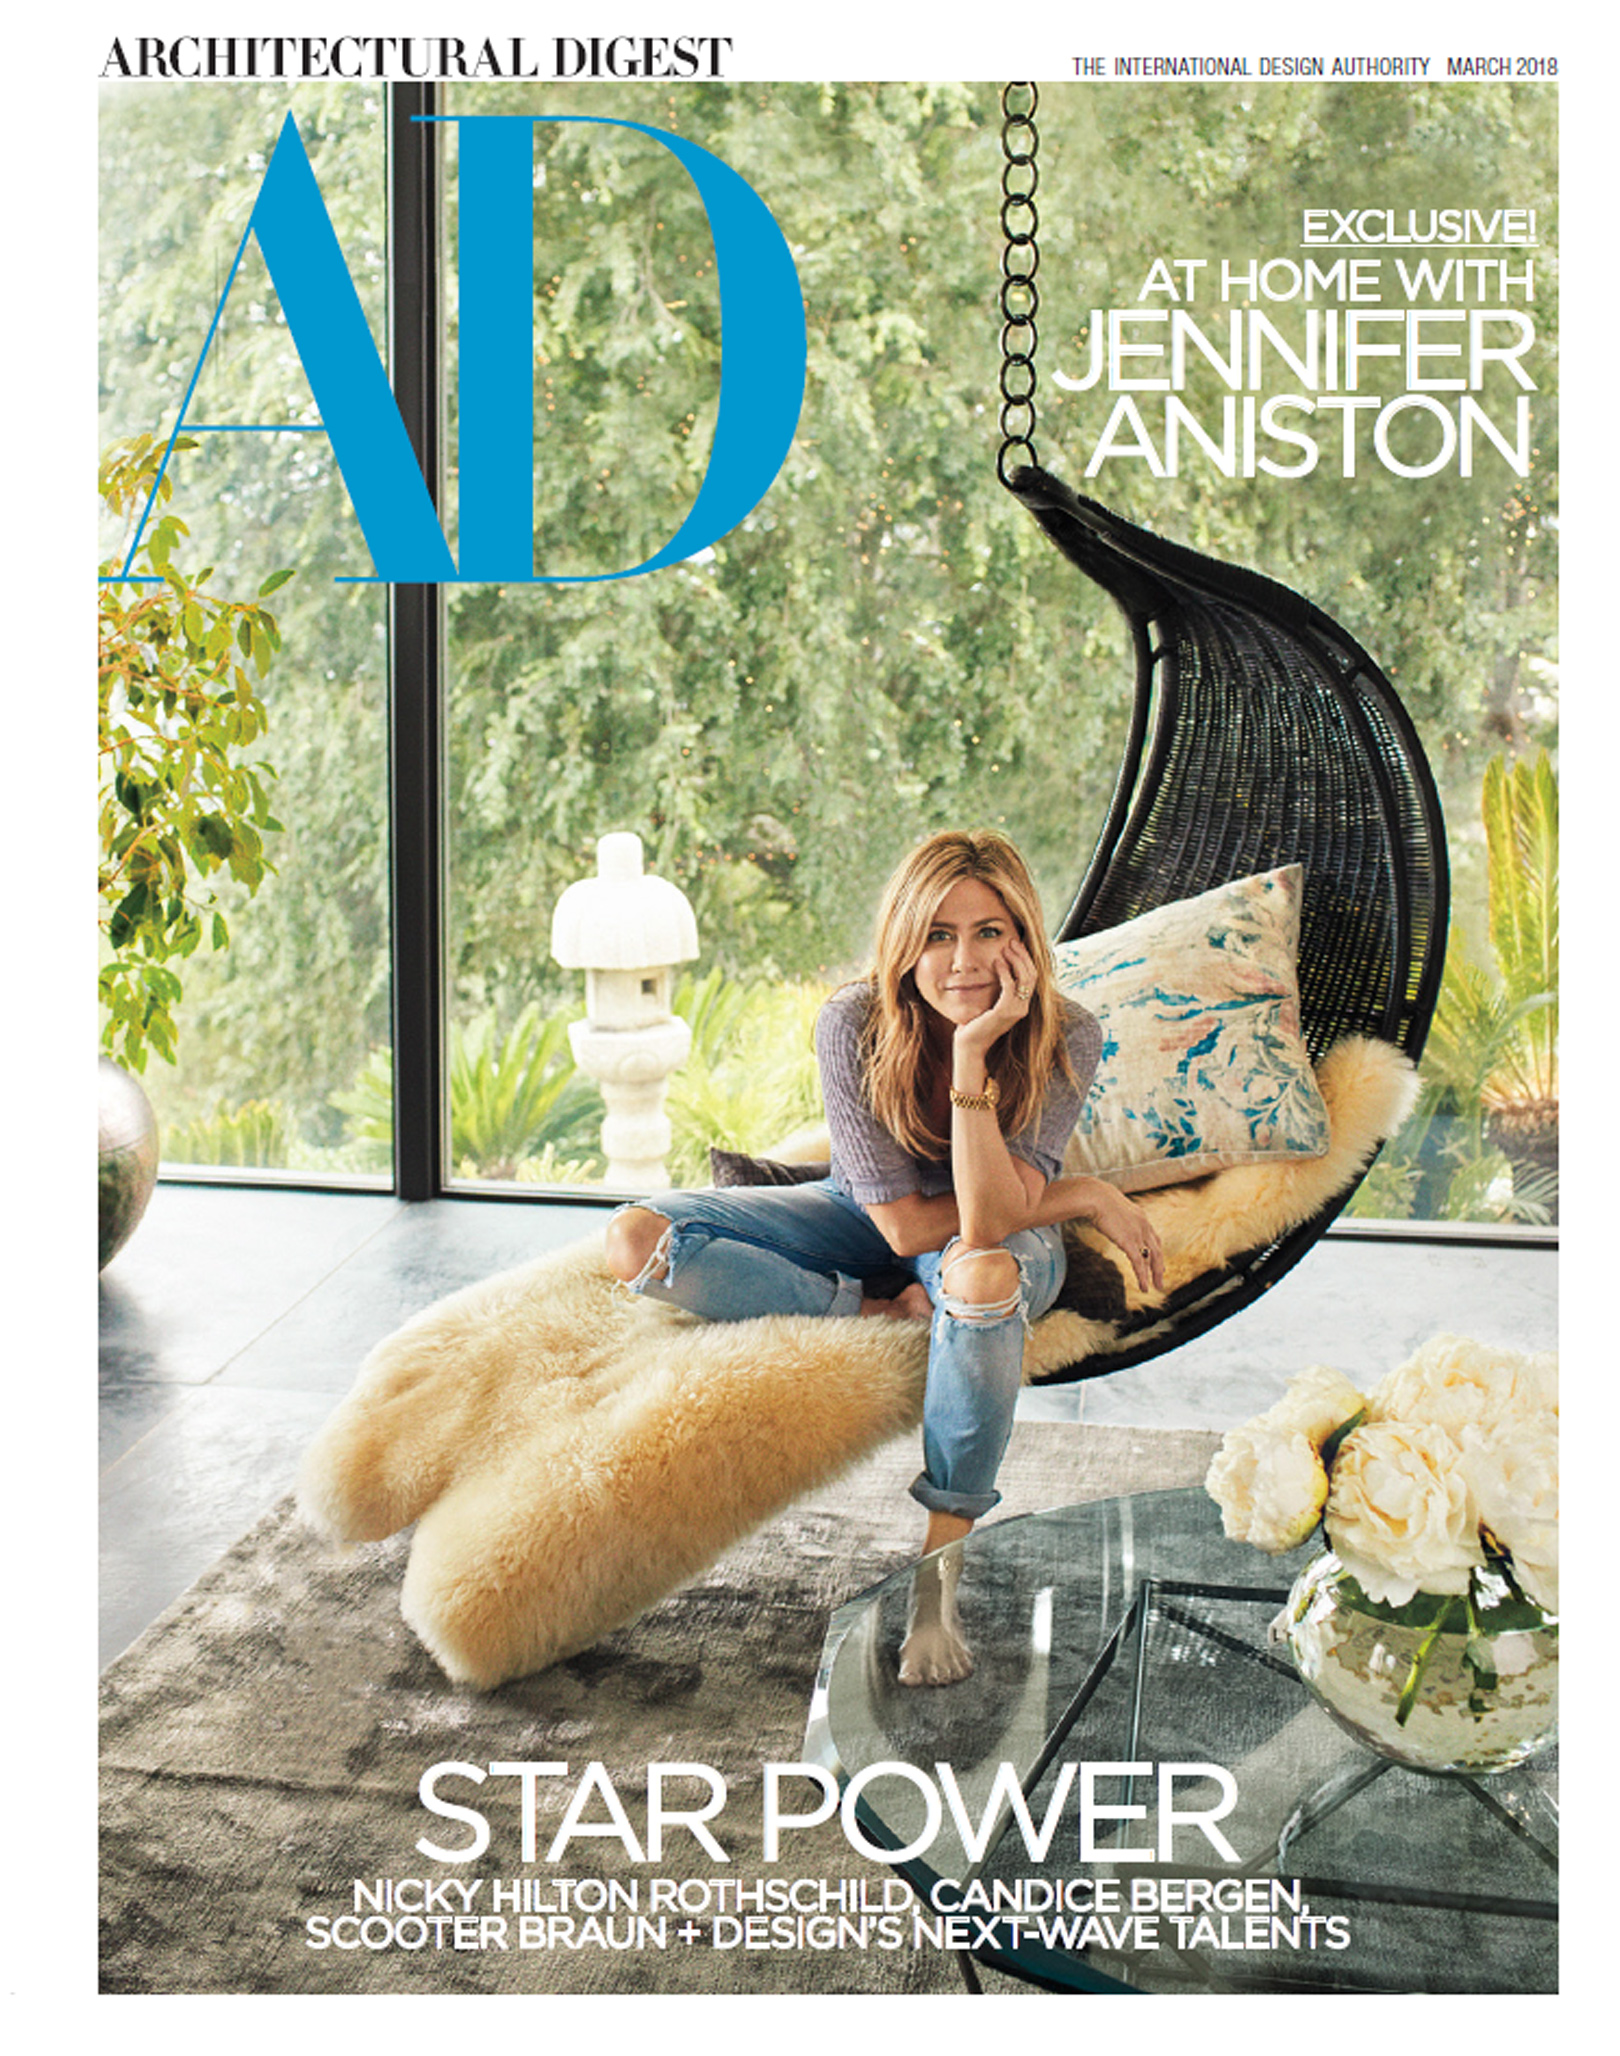 Jennifer_Aniston_AD_Cover